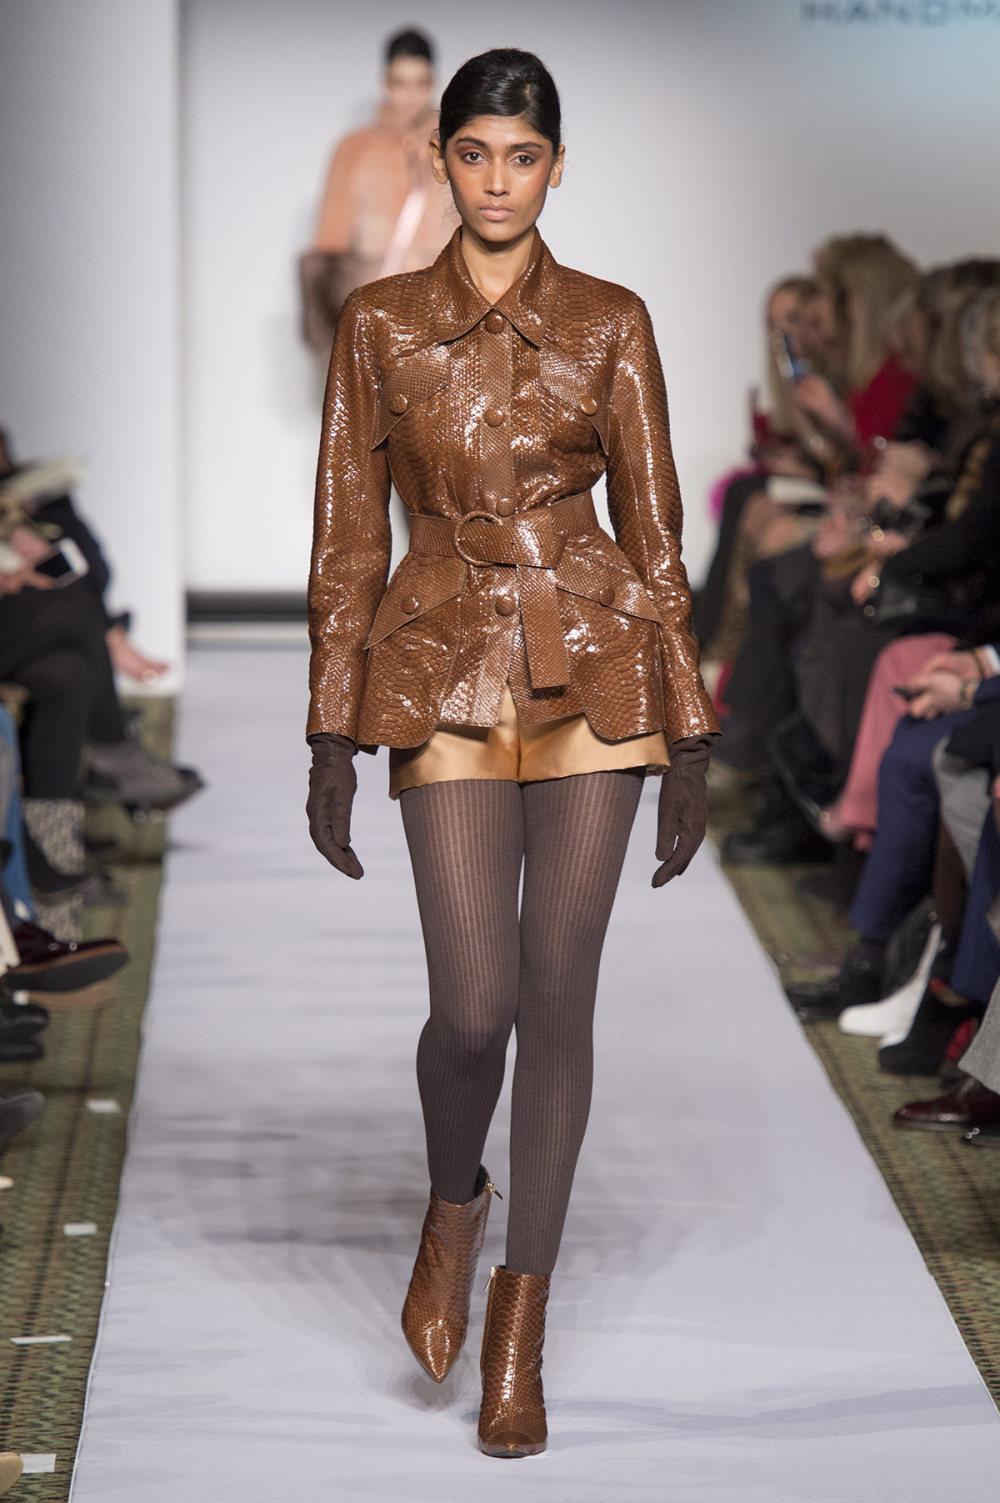 Carolina Herrera时装系列用鲜艳的颜色充满智能的黑白色调-38.jpg